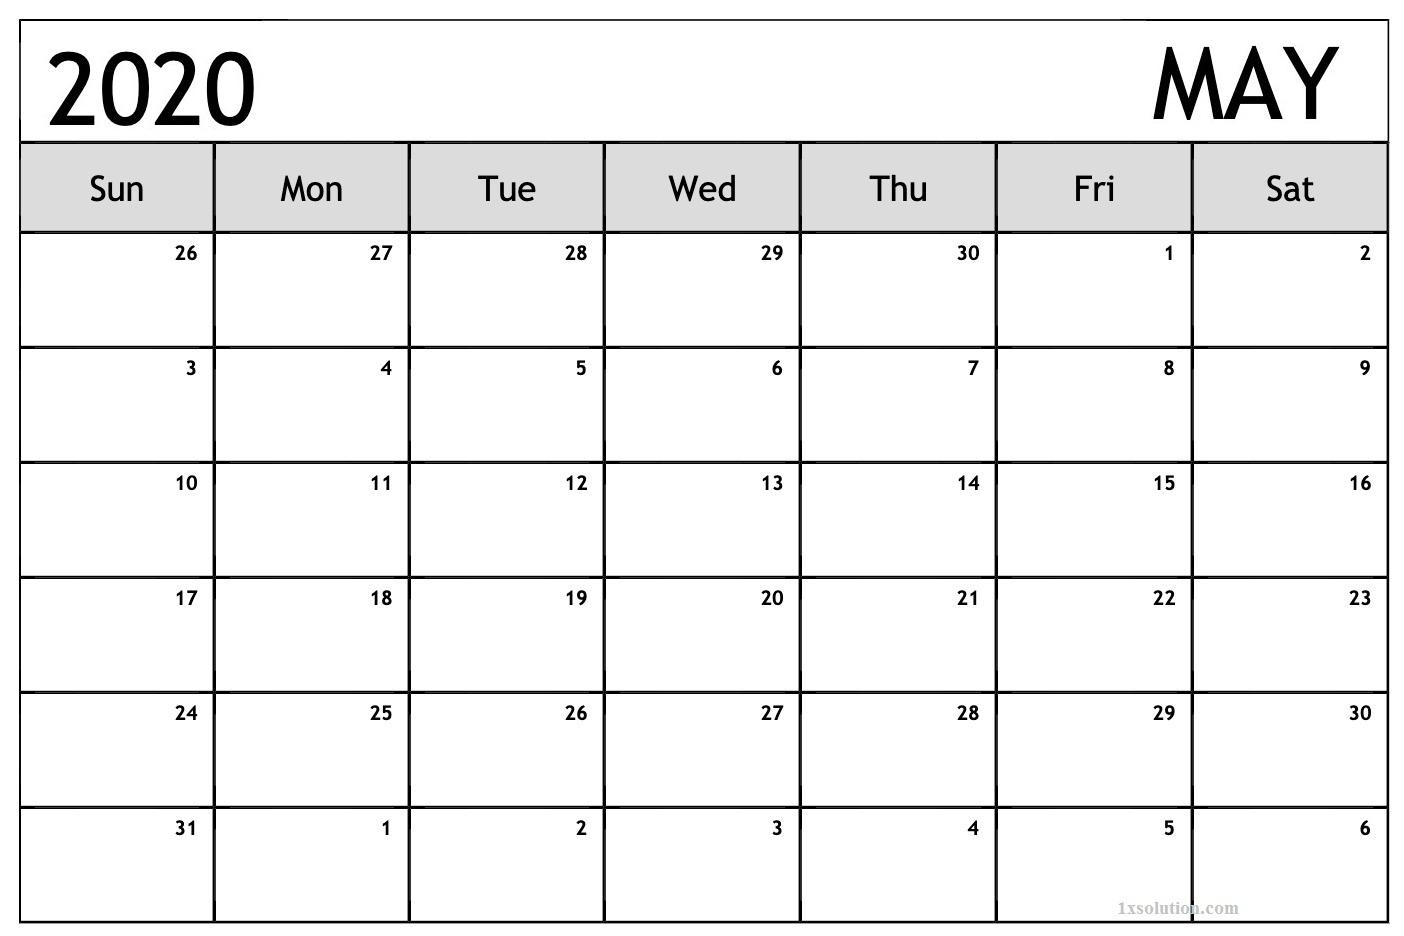 May 2020 PDF Calendar